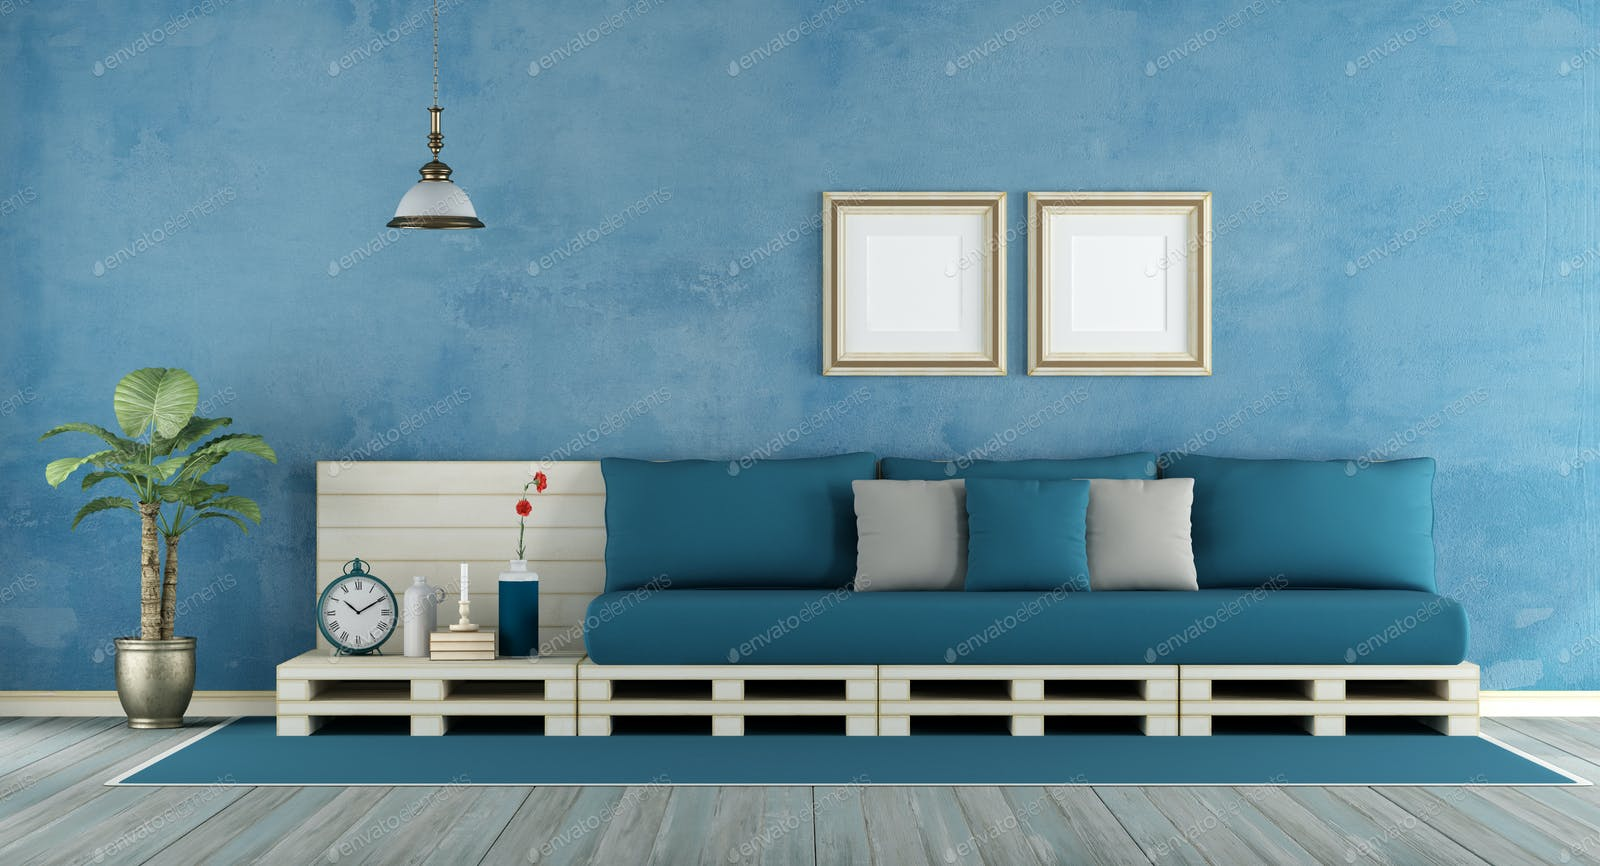 Blue retro living room photo by archideaphoto on Envato Elements